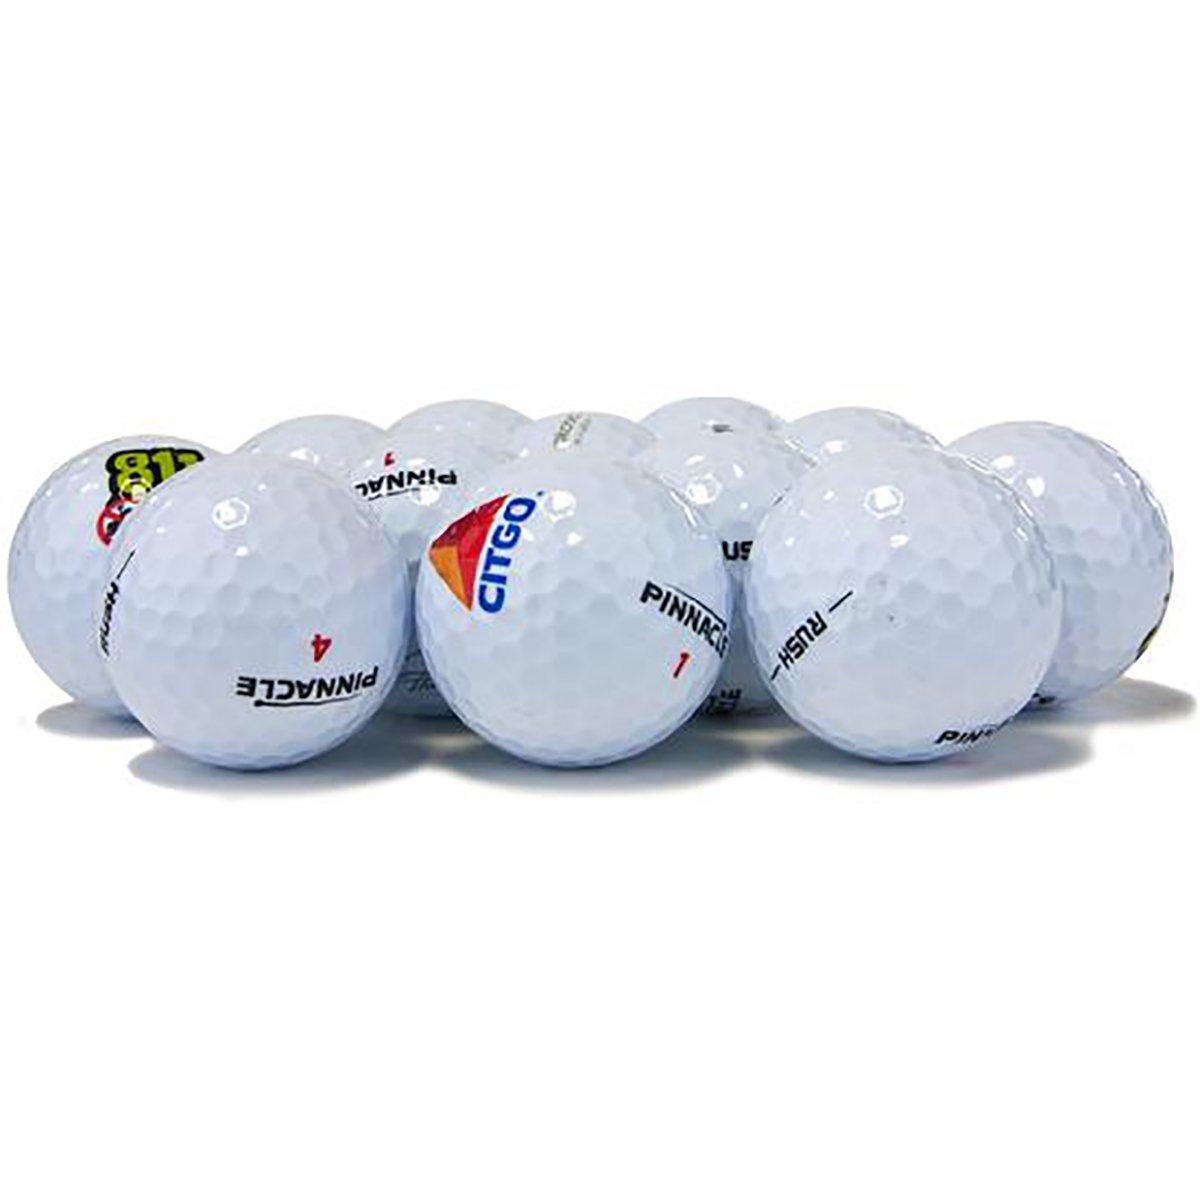 Pinnacle Assortedロゴオーバーランゴルフボール3ダース36ボール) B01KK65G9S